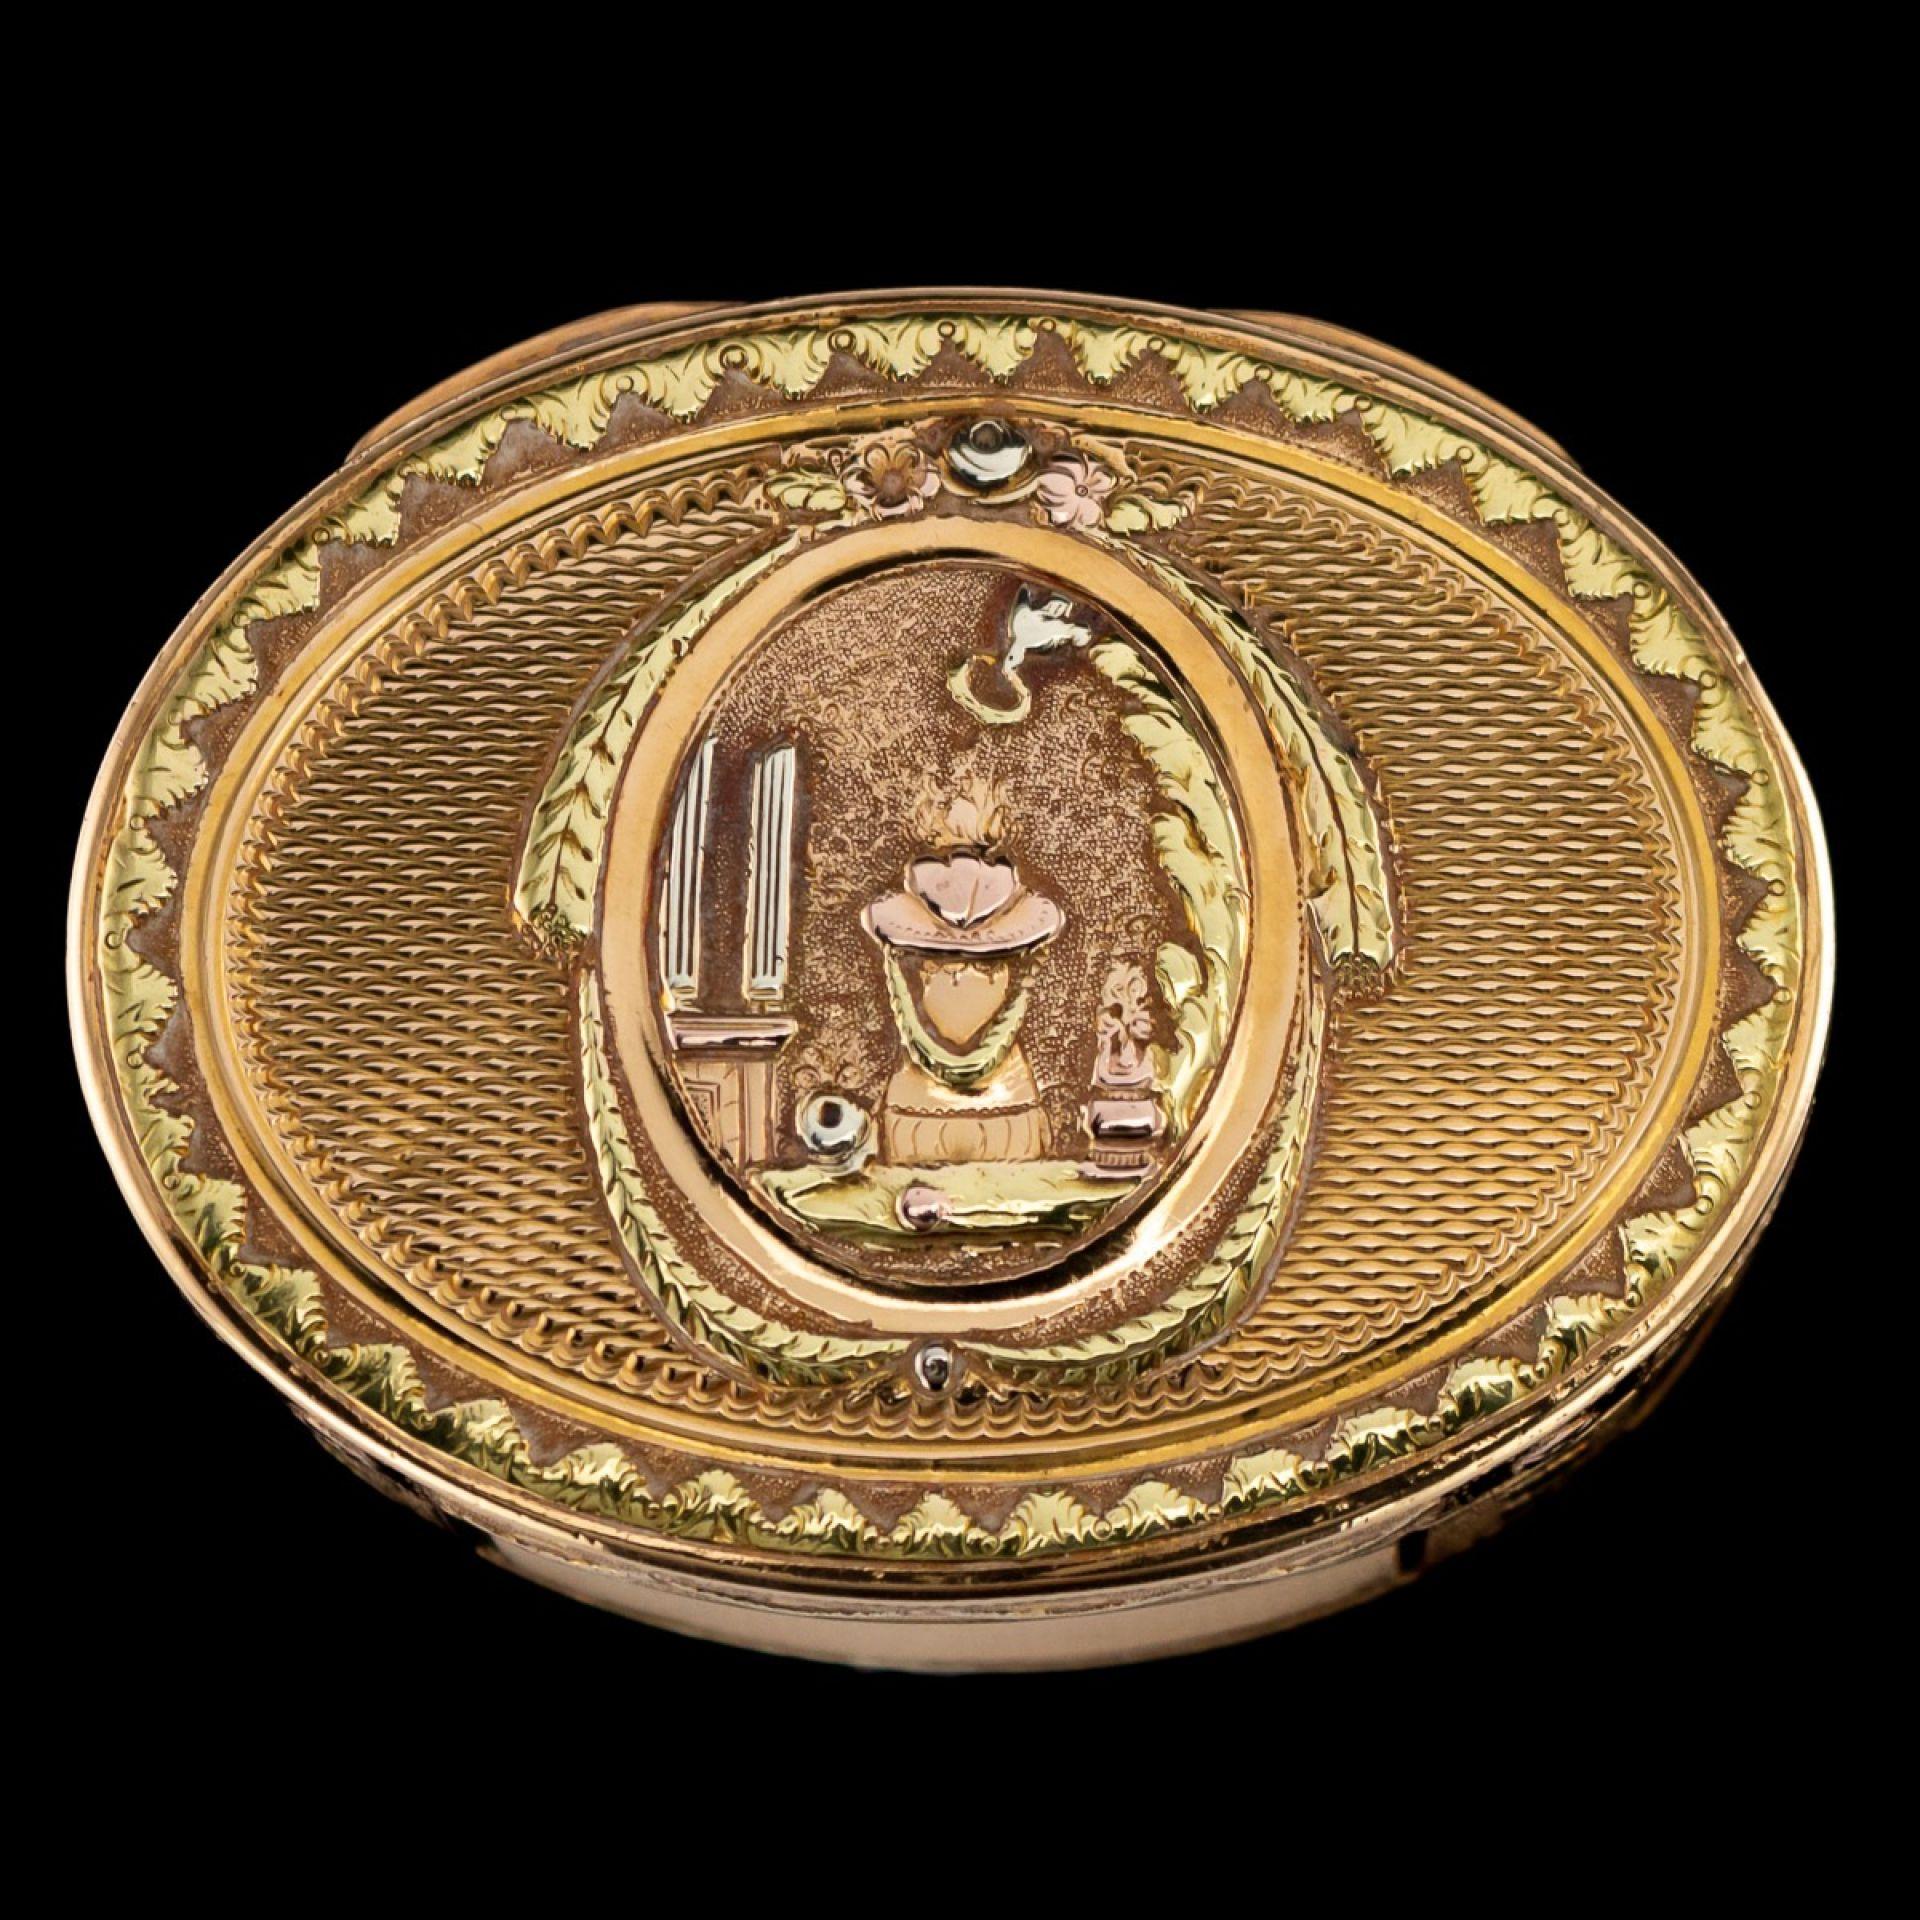 ANTIQUE 18thC FRENCH 18k THREE-COLOUR GOLD SNUFF BOX c.1770